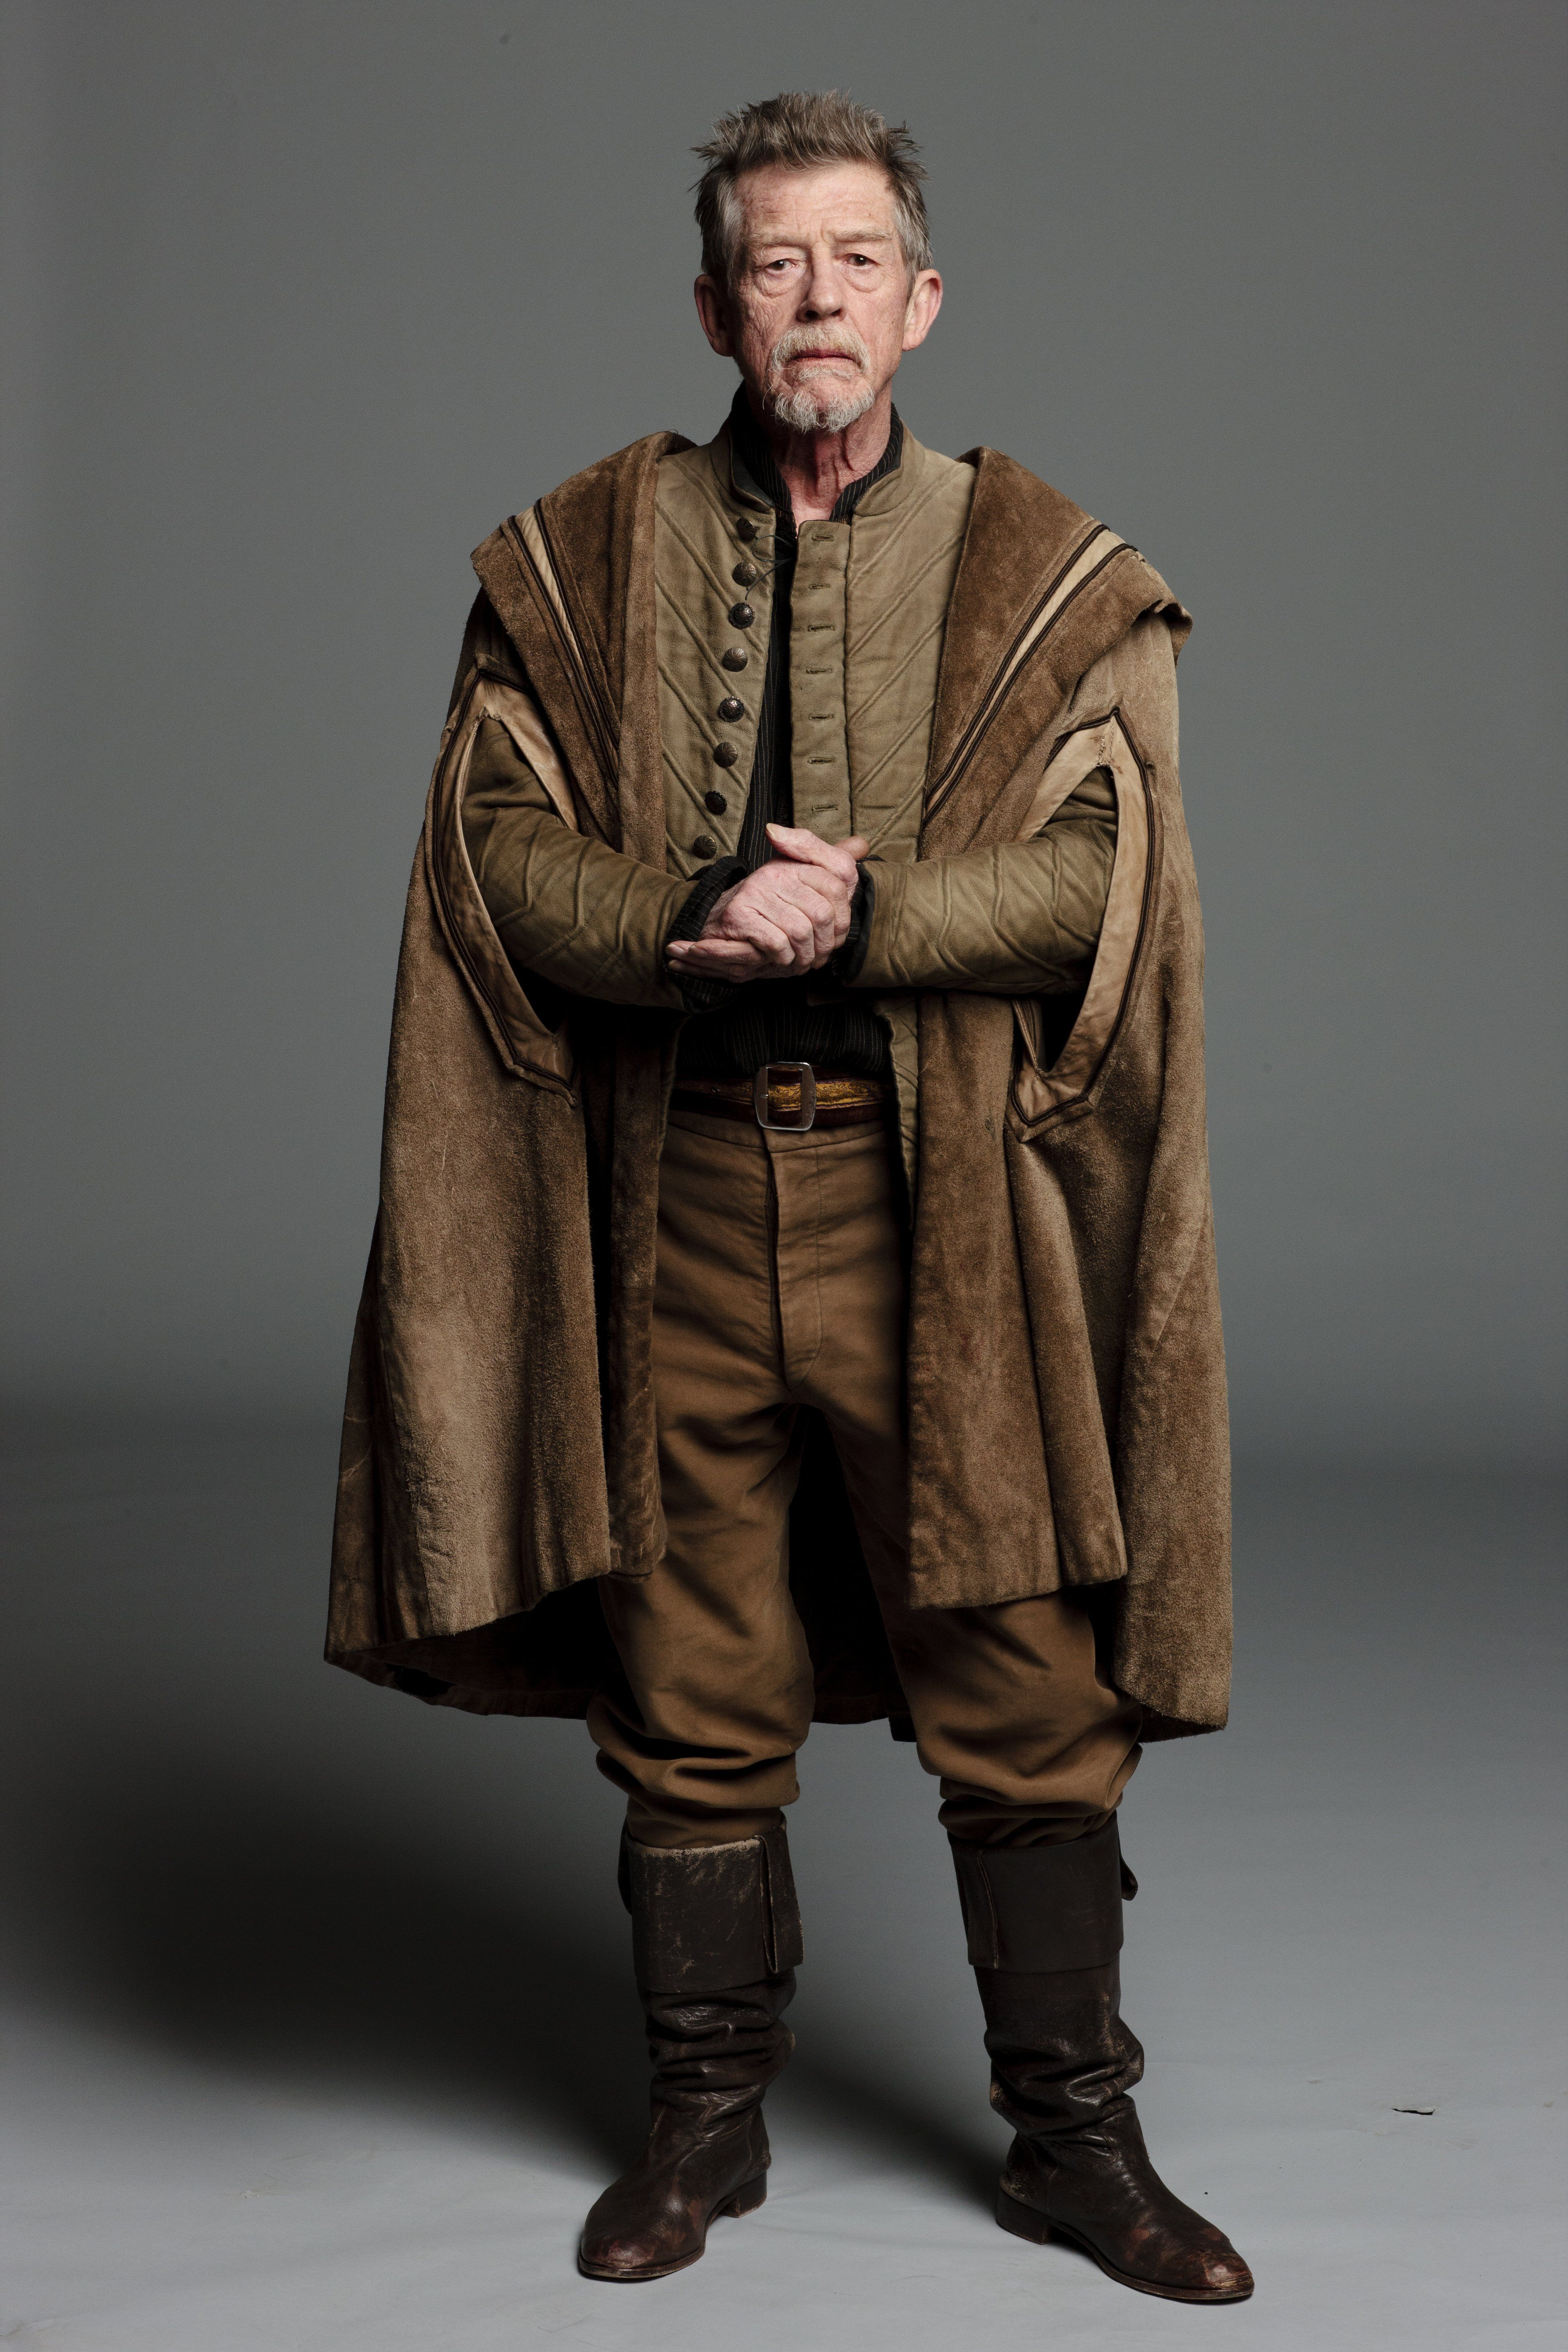 Shakespeare's Costume/Hair/Makeup maybe make his beard